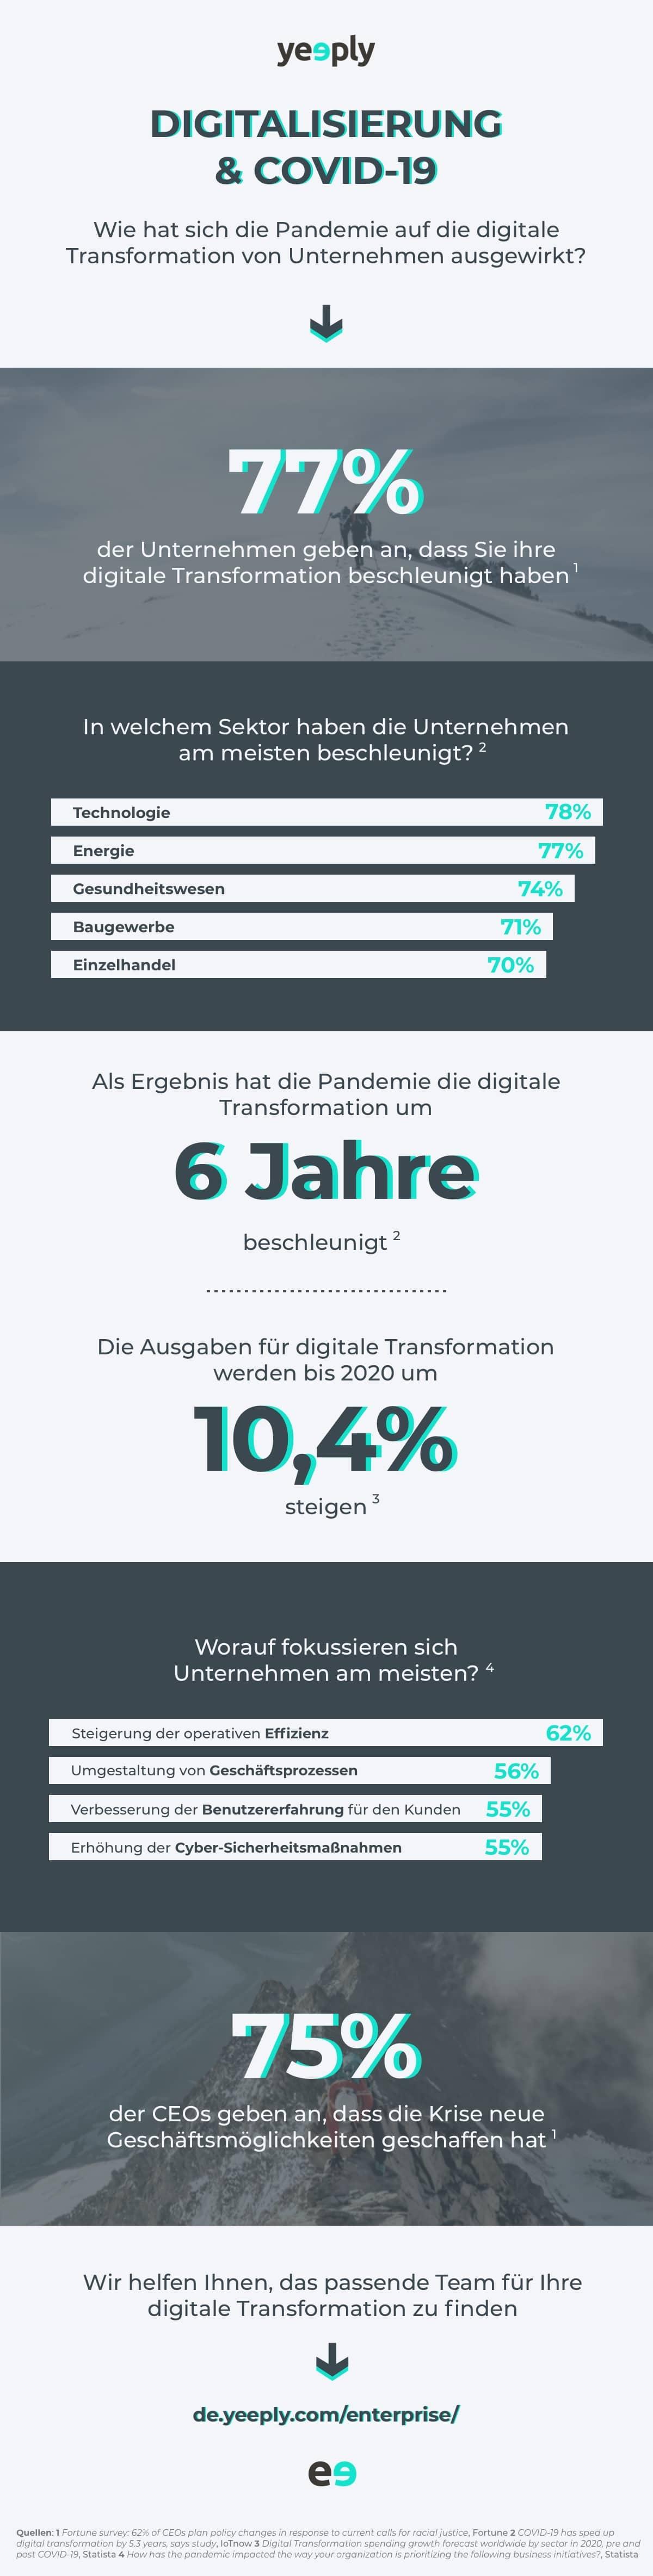 Infografik - Digitalisierung & COVID 19